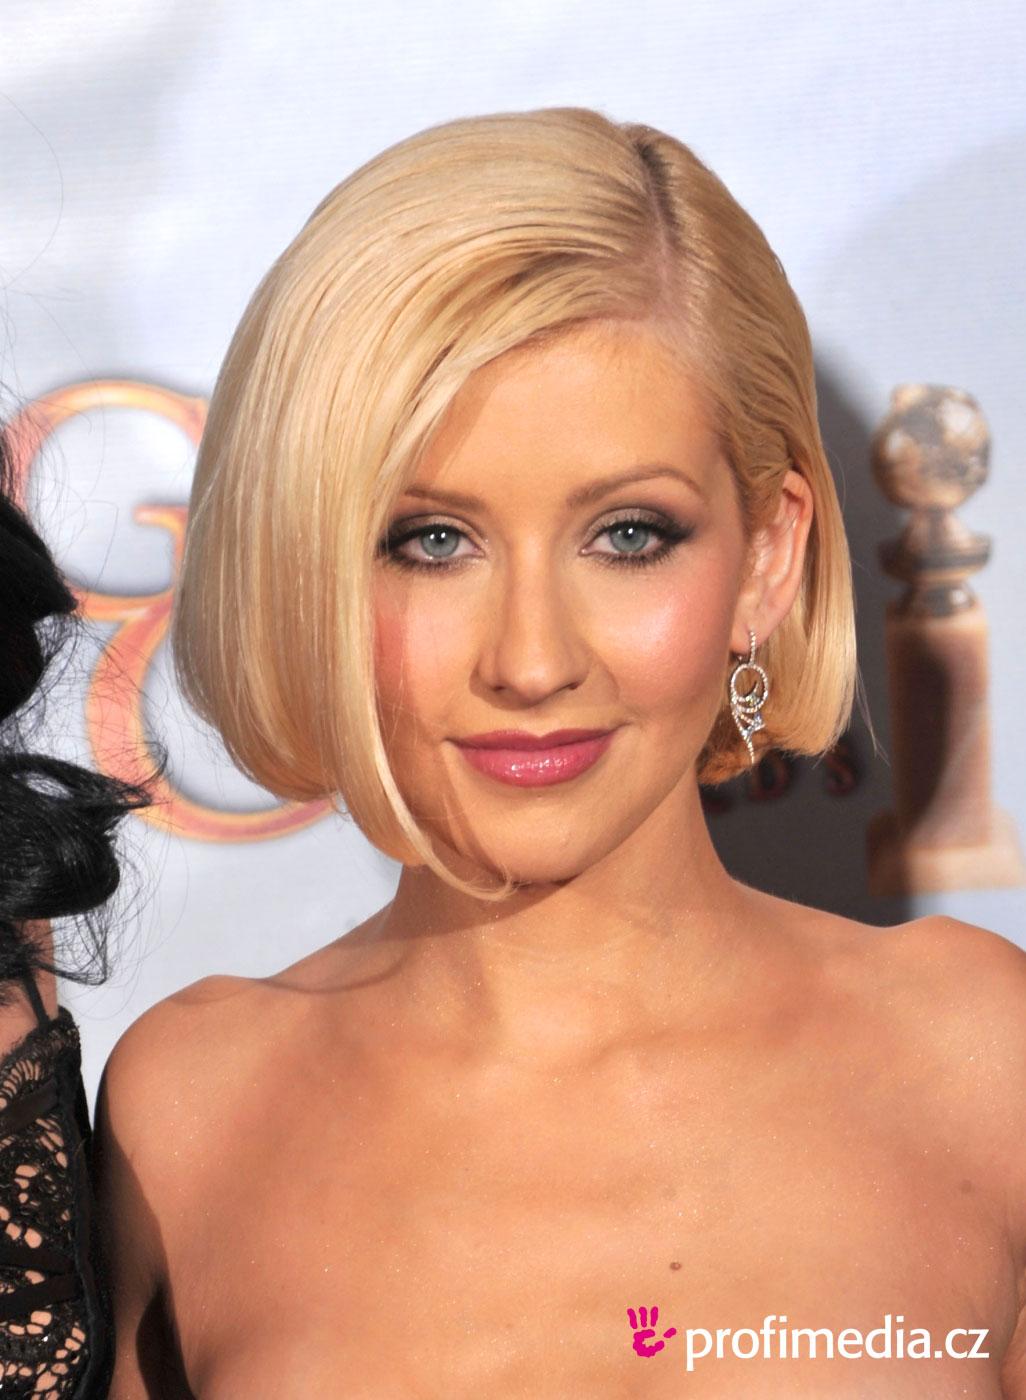 http://2.bp.blogspot.com/-rB0GWhFEB0g/TzJa_2Bpt4I/AAAAAAABvTk/NJb760u011M/s1600/Christina+Aguilera+hairstyle+pictures+(69).jpg